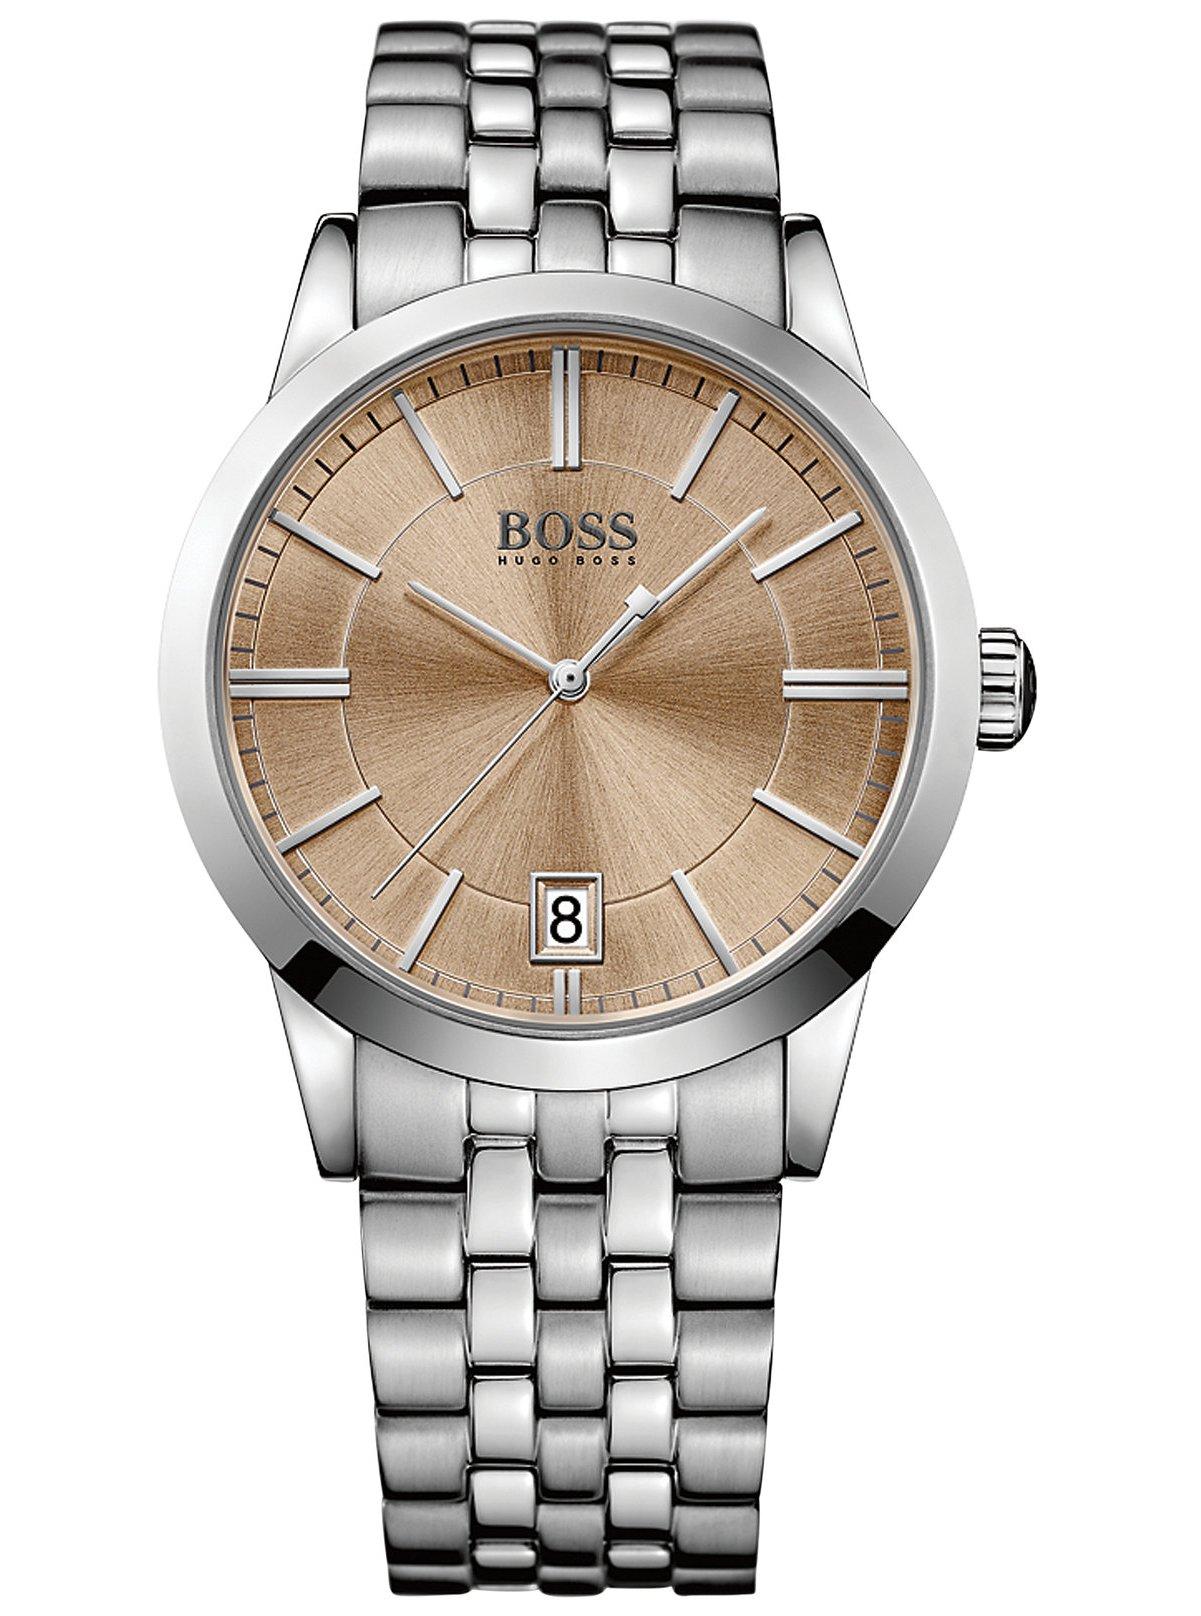 Часы наручные мужские Hugo Boss, цвет: стальной, бежевый. HB-153-06HB-153-06